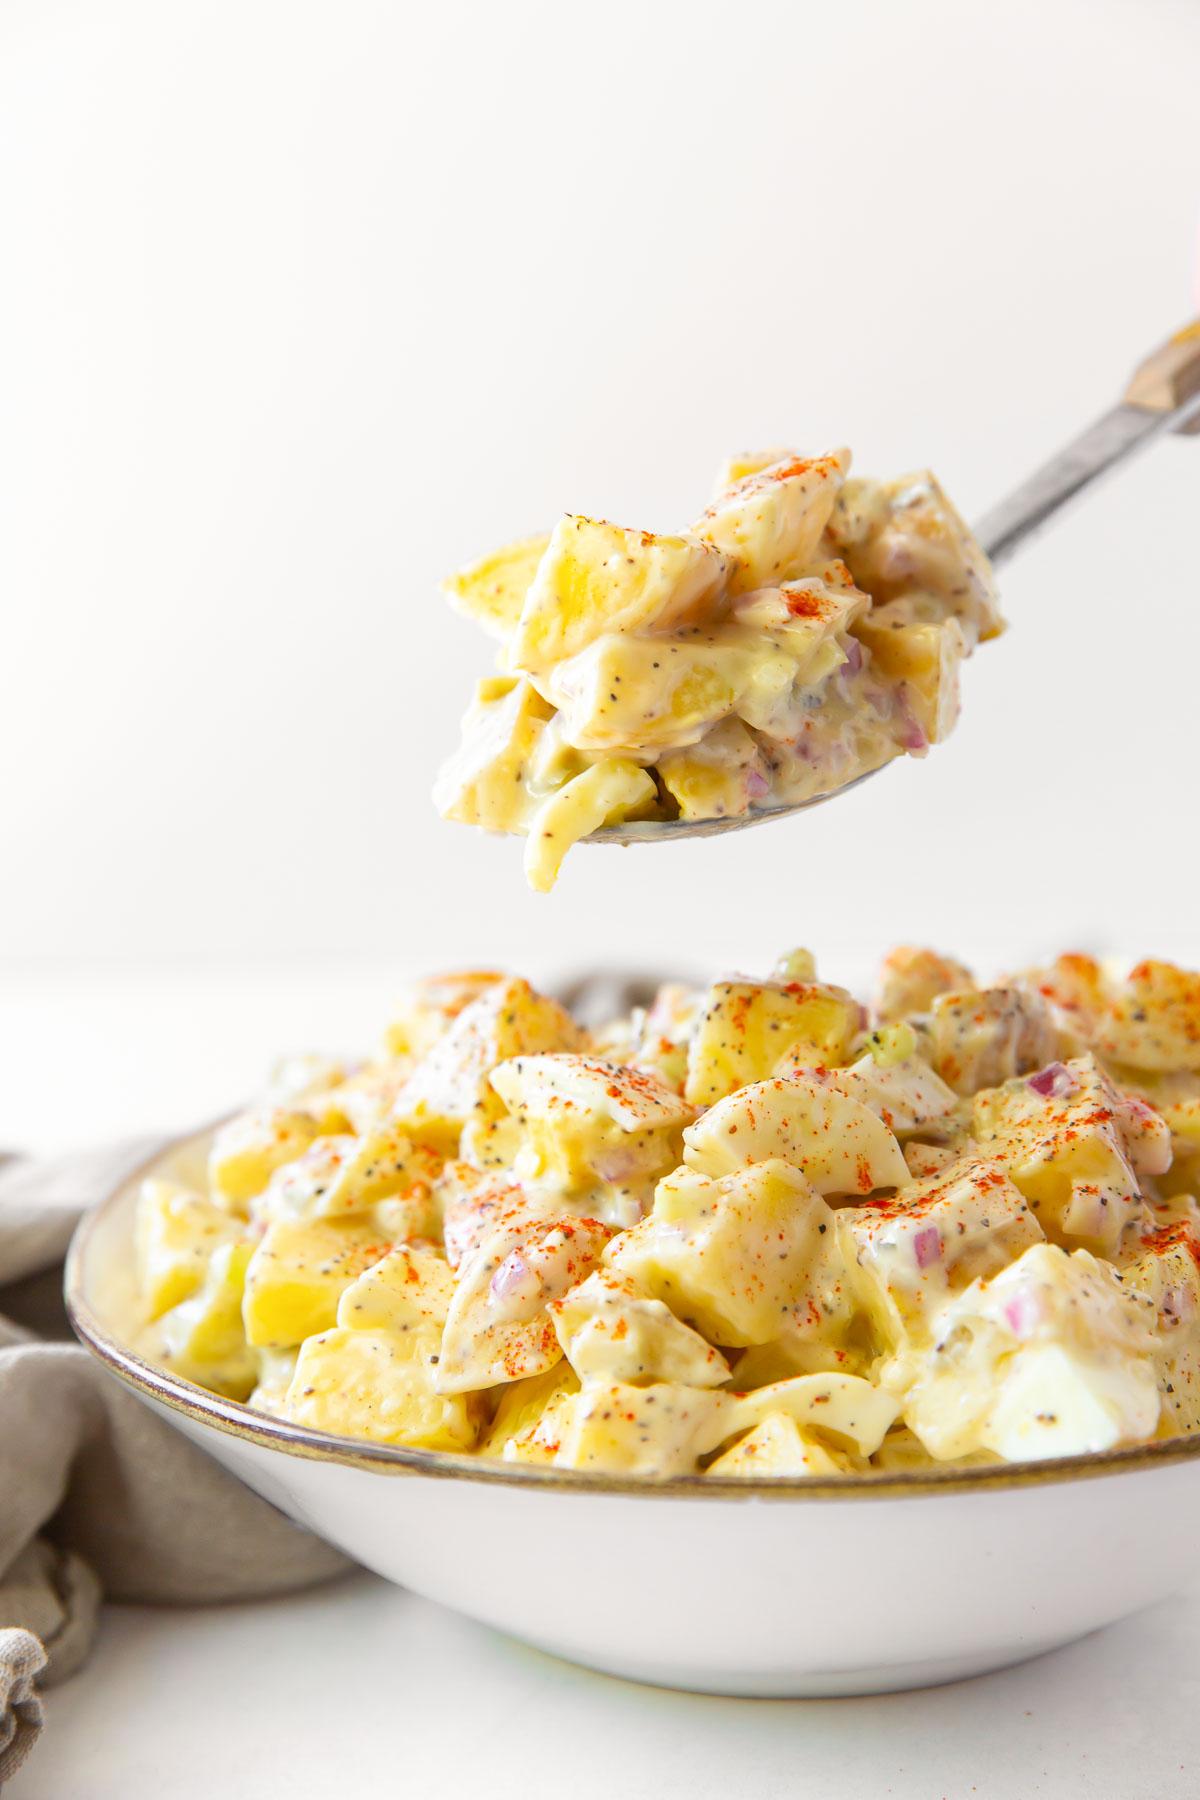 potato salad on a serving spoon held over a bowl of potato salad